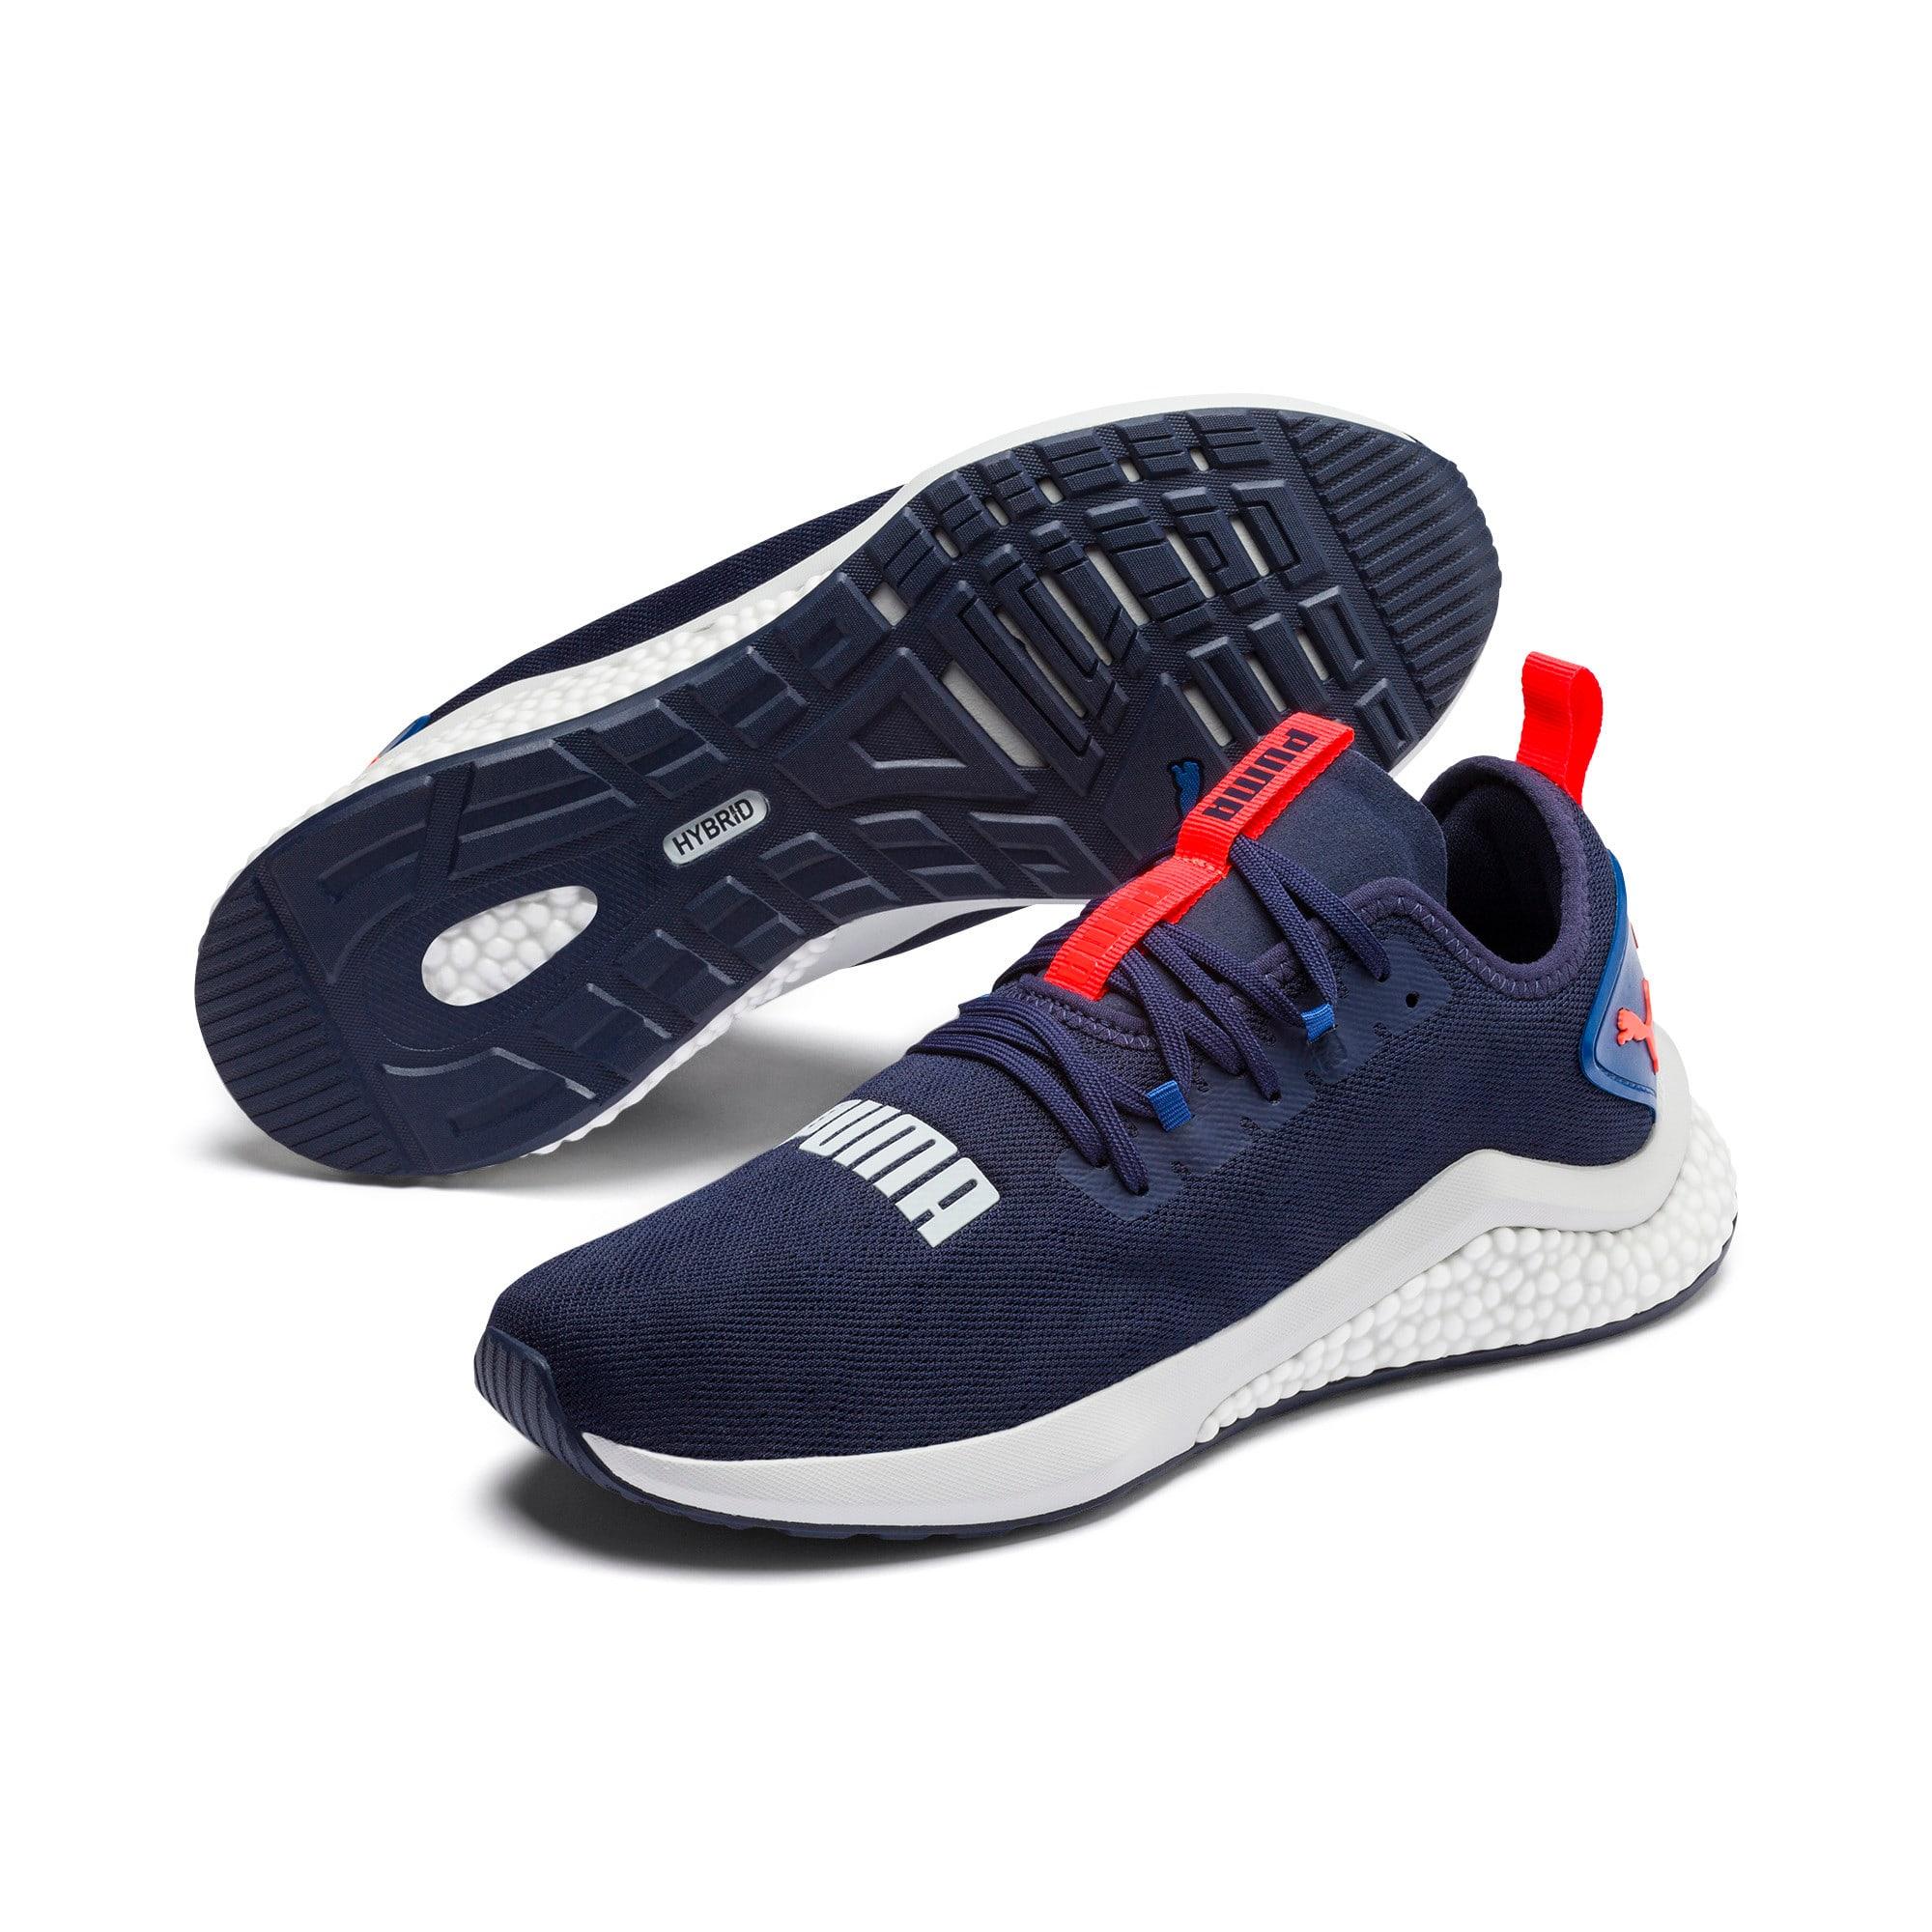 Thumbnail 2 of HYBRID NX Camo Men's Running Shoes, GalaxyBlue-Peacoat-HighRise, medium